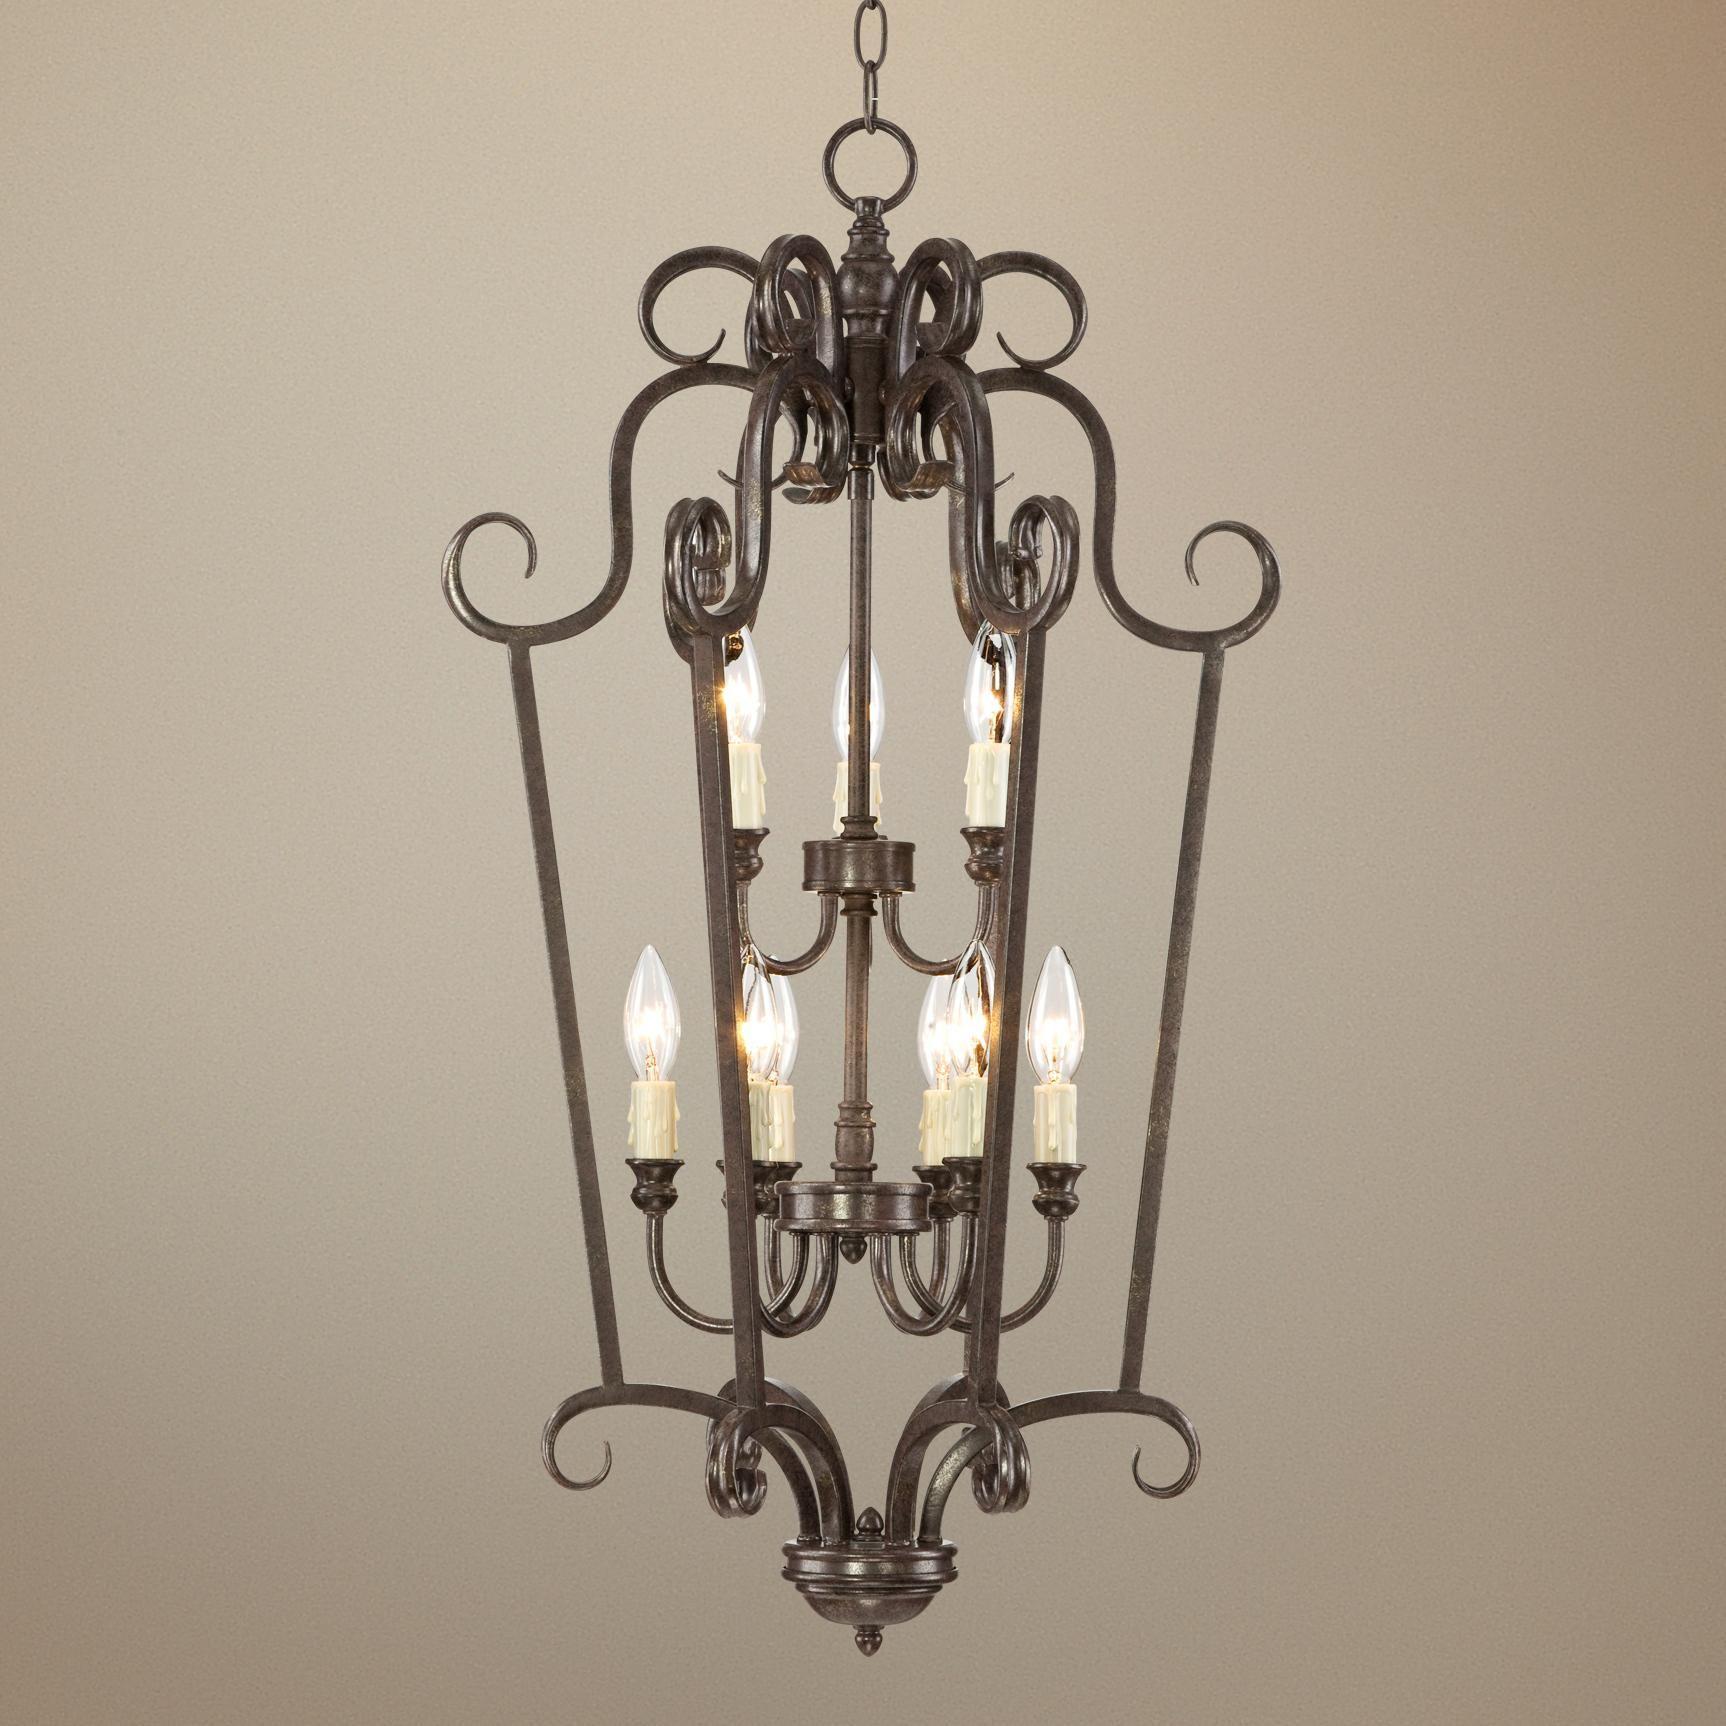 "Traditional Curves 17"" Wide Iron Foyer Pendant Light   LampsPlus.com"